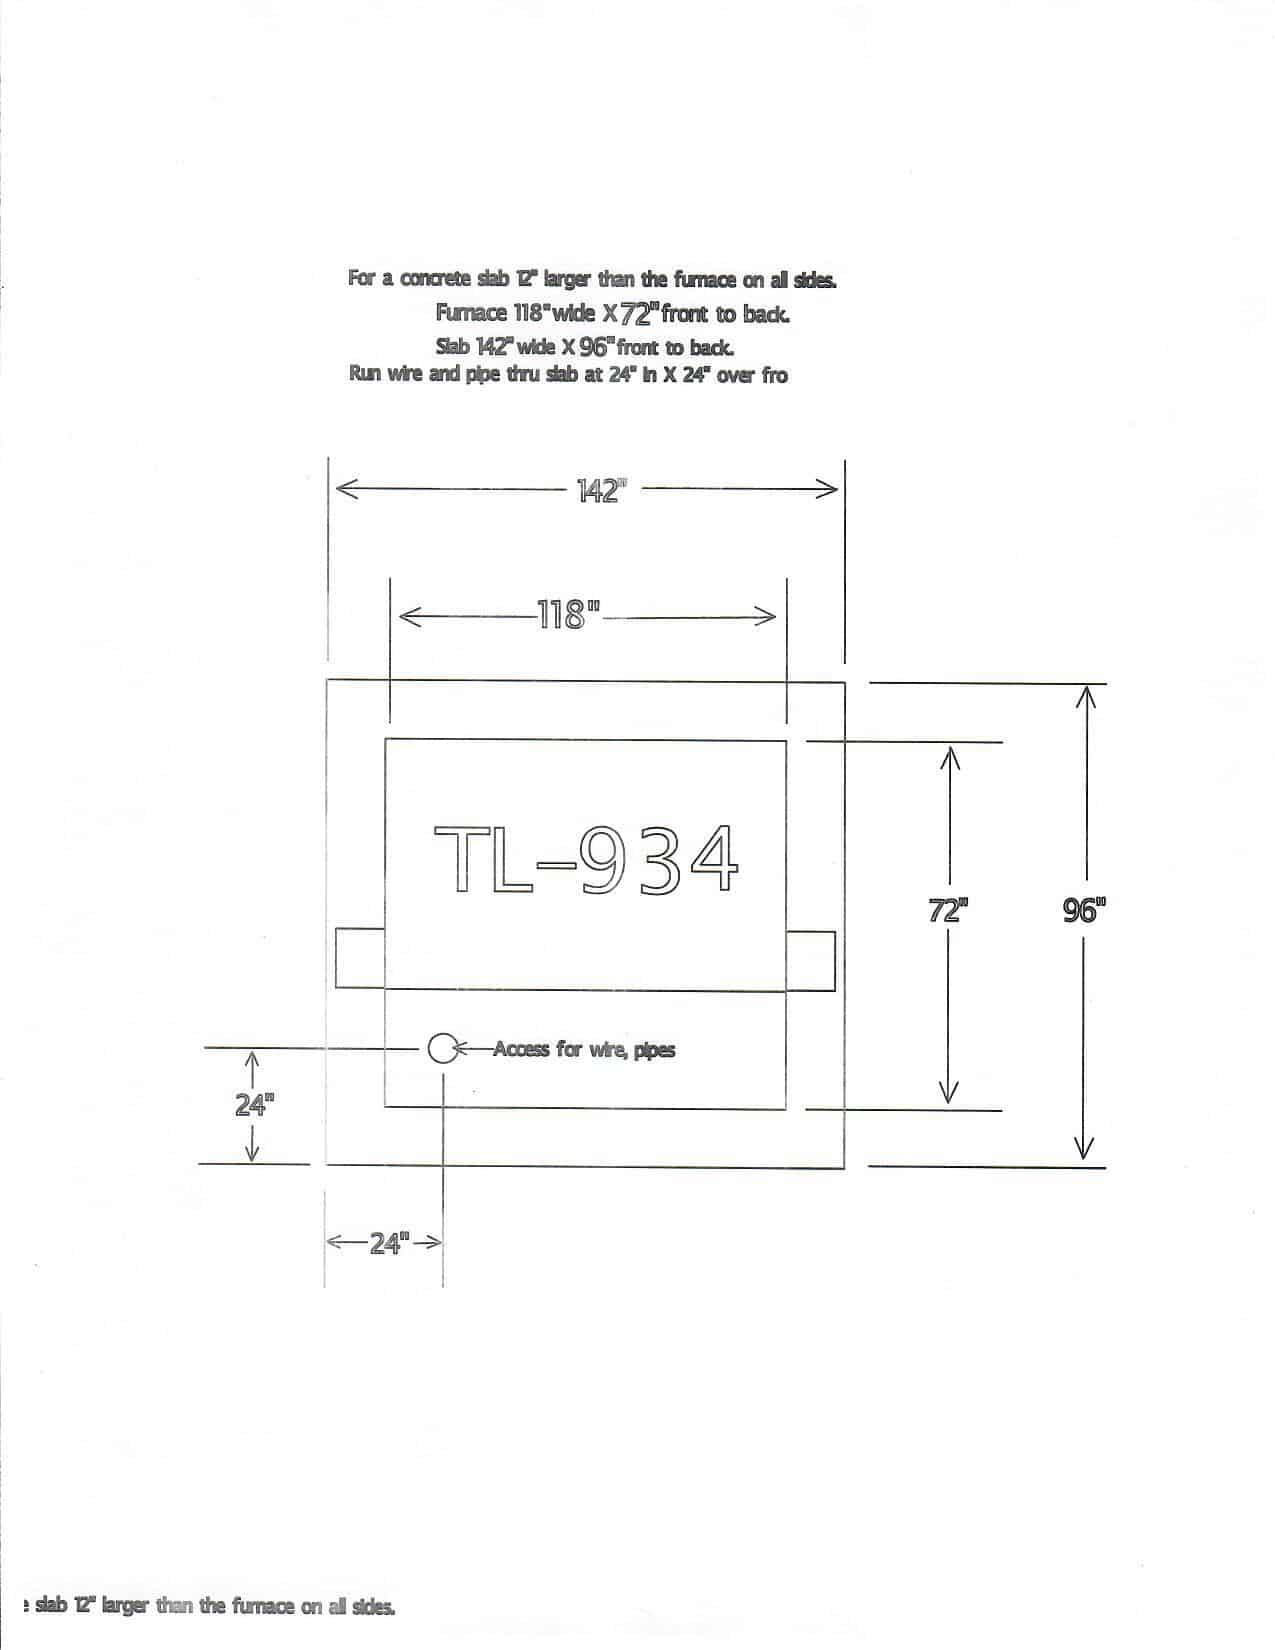 schumacher diagram psw 306wiring free mindmap free download velvac wiring diagram 934 wiring diagram schumacher schumacher 3050 pwiring diagram tl 934 934 wiring diagram schumacherhtml schumacher diagram psw 306wiring free